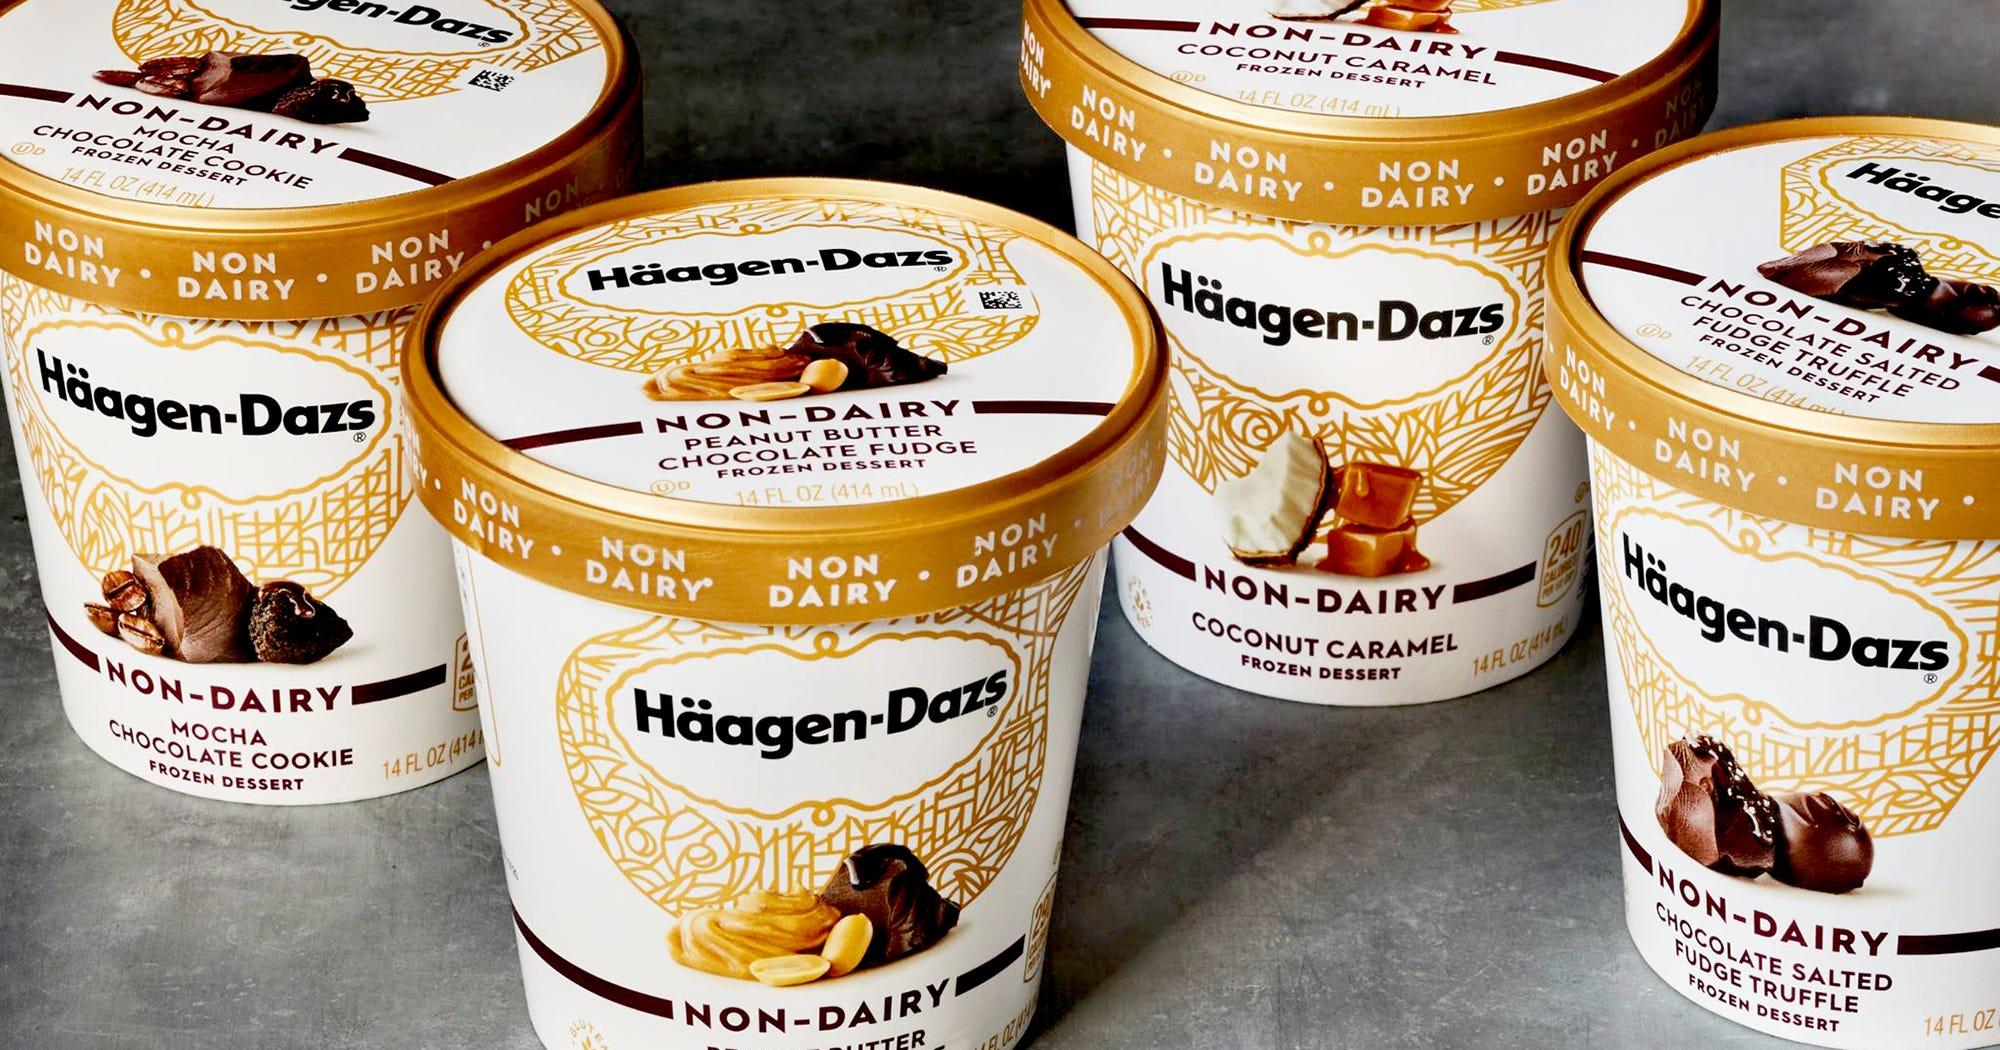 Haagen Dazs New Non Dairy Ice Cream Flavors